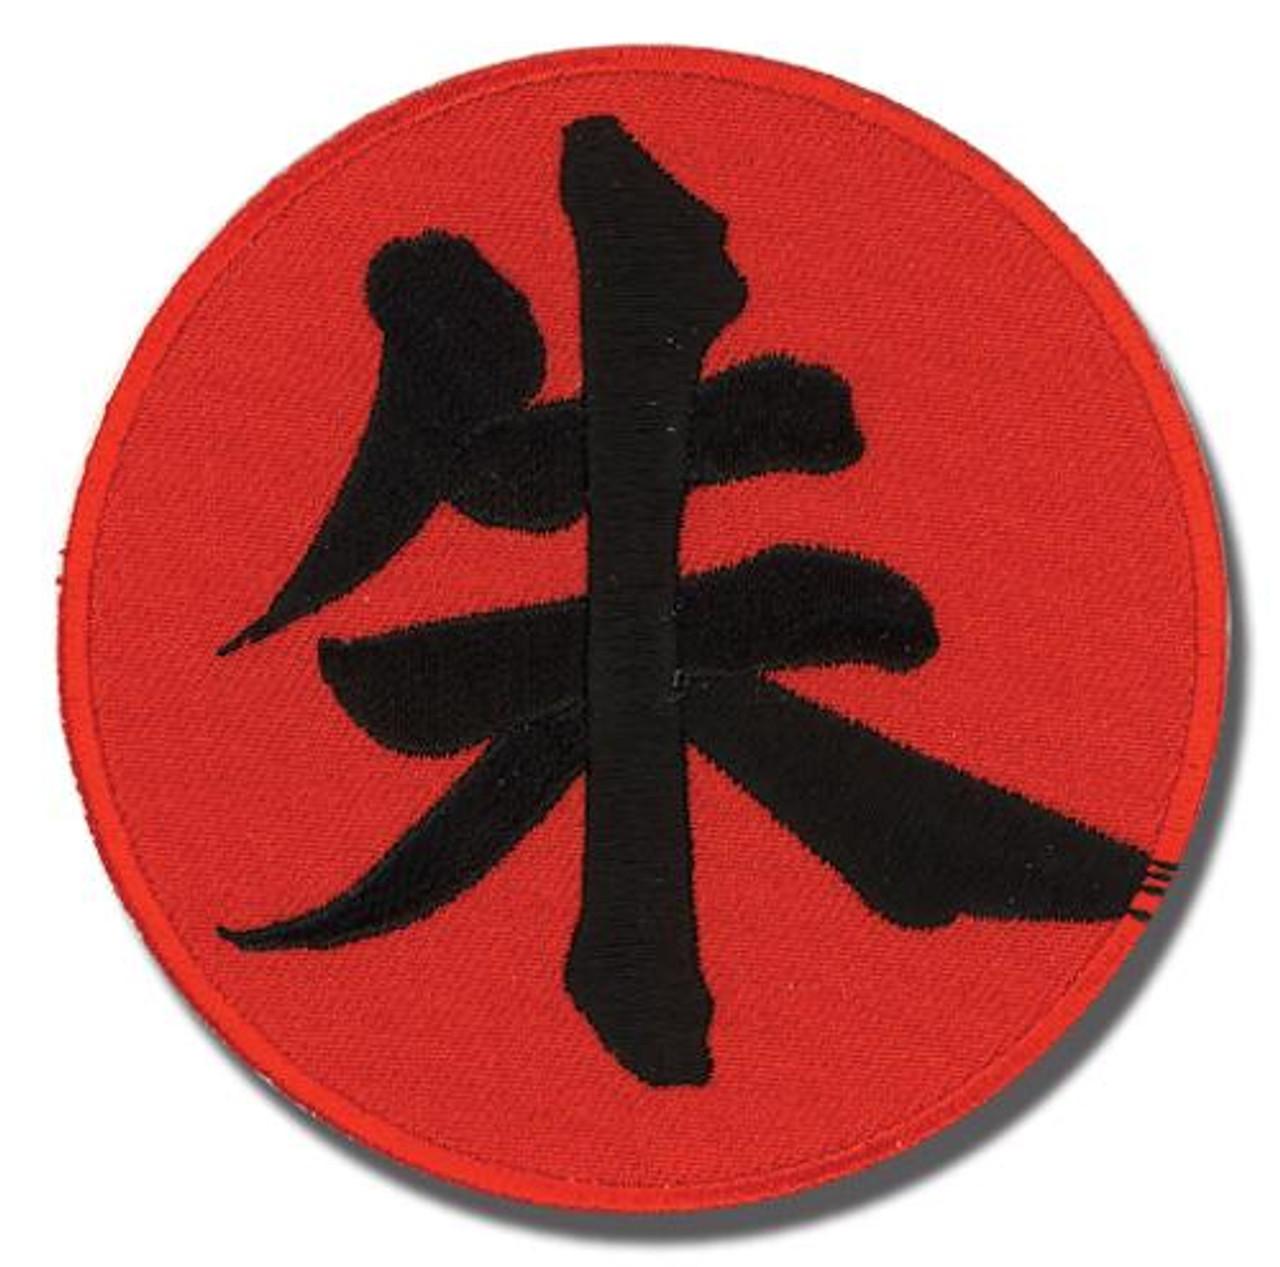 Naruto Shippuden Itachi Kenji Patch